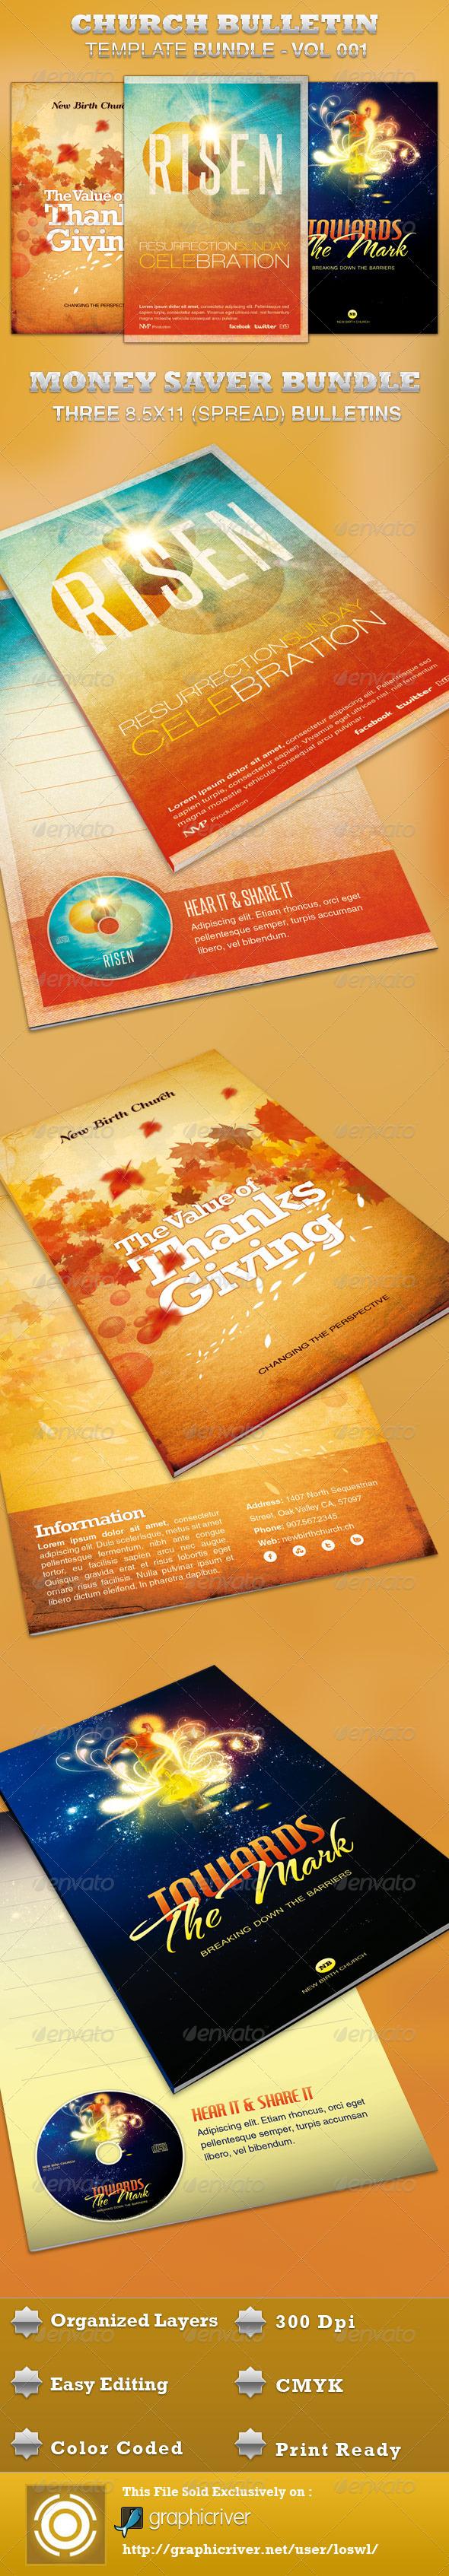 GraphicRiver Church Bulletin Template Bundle-Vol 001 3581498